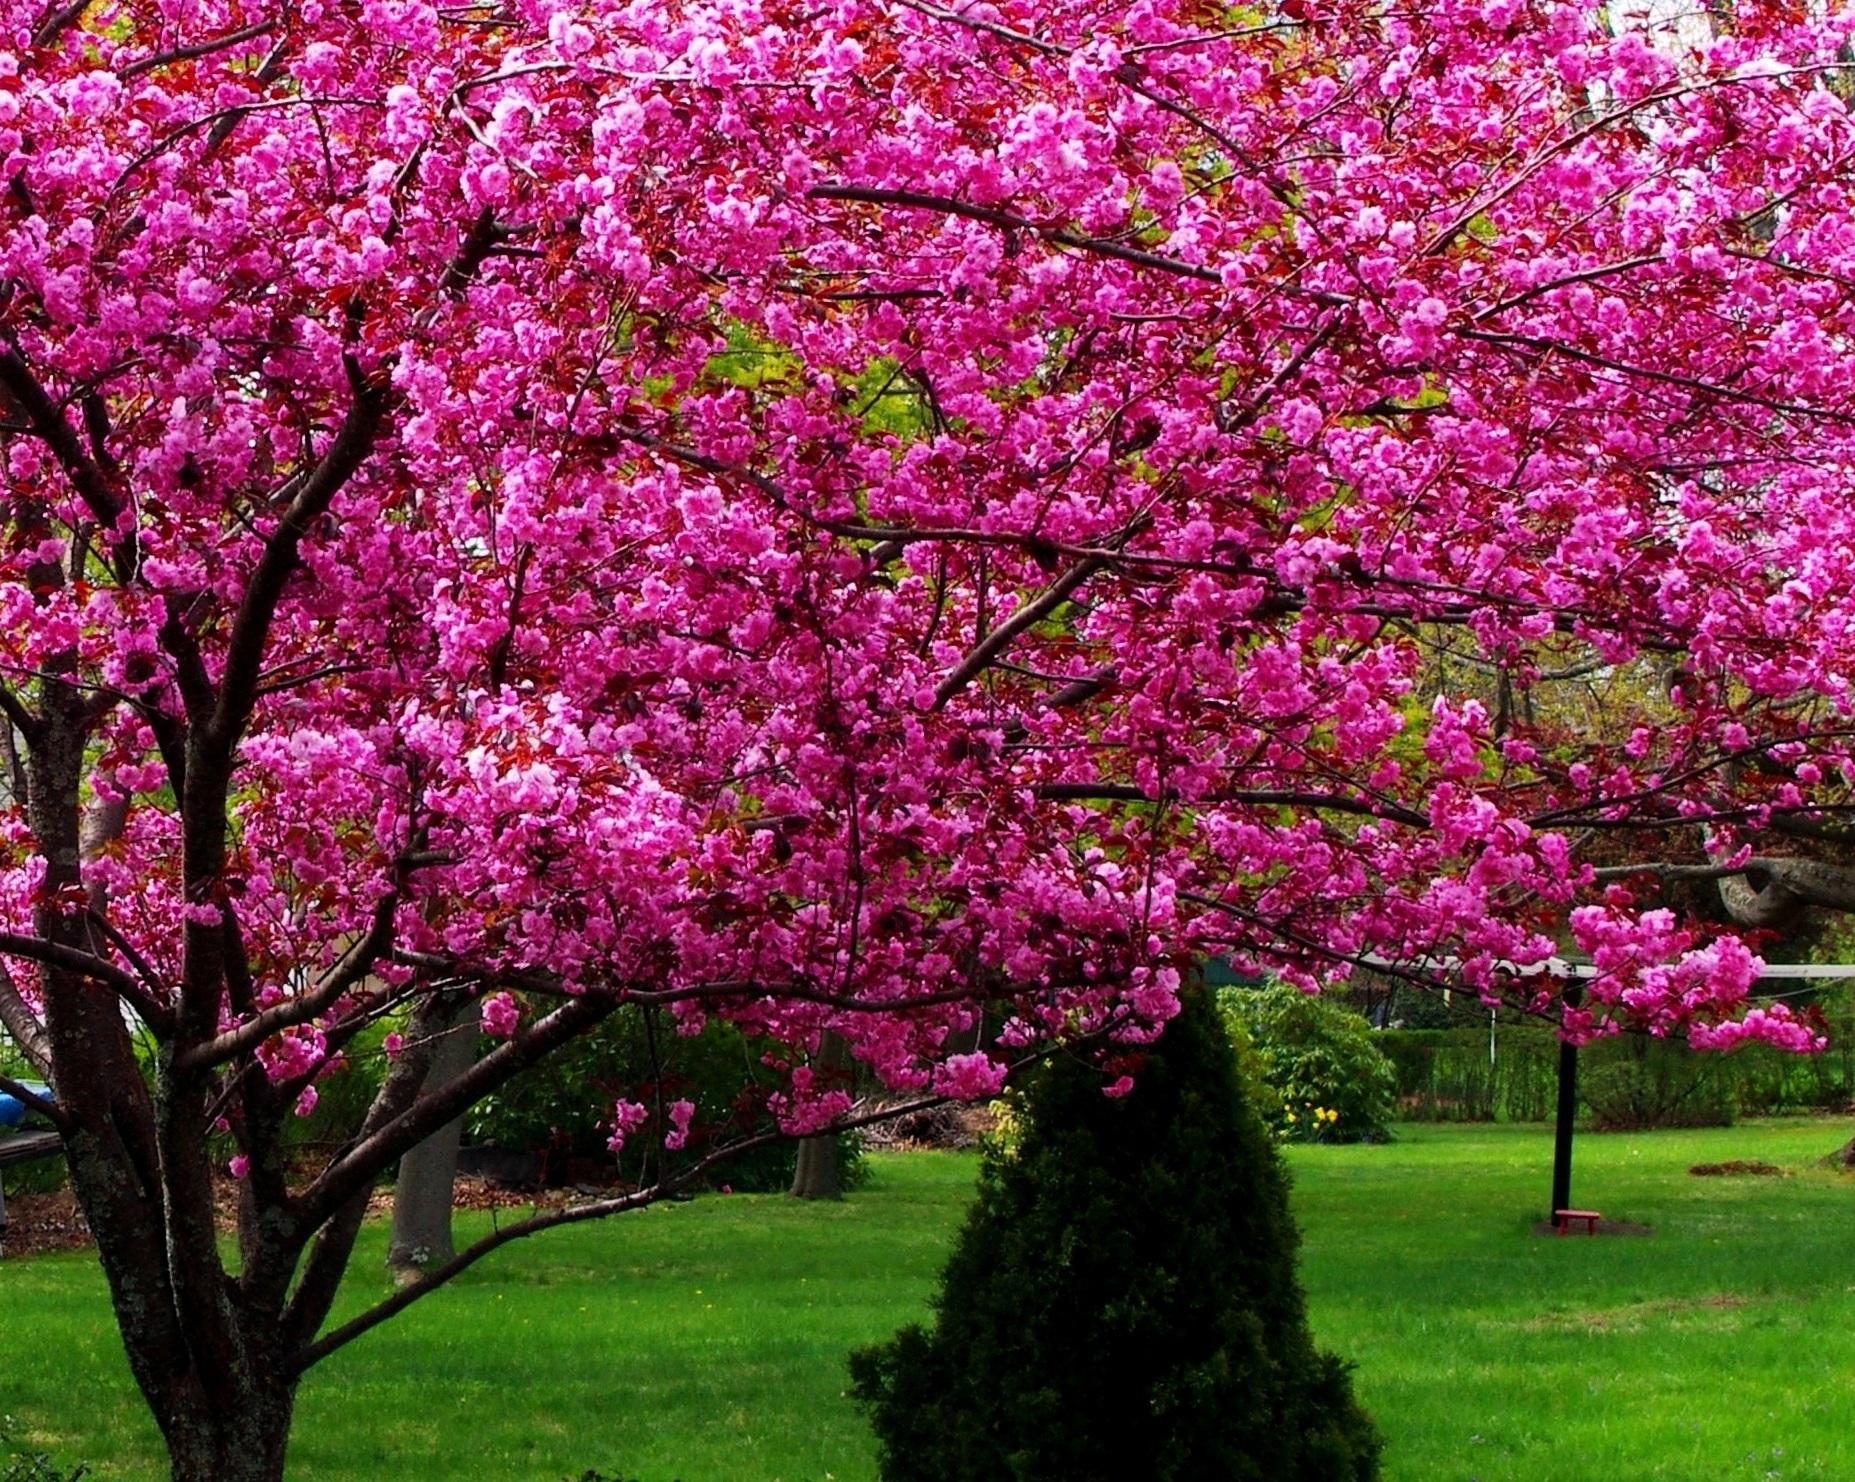 Florals Jdt Images